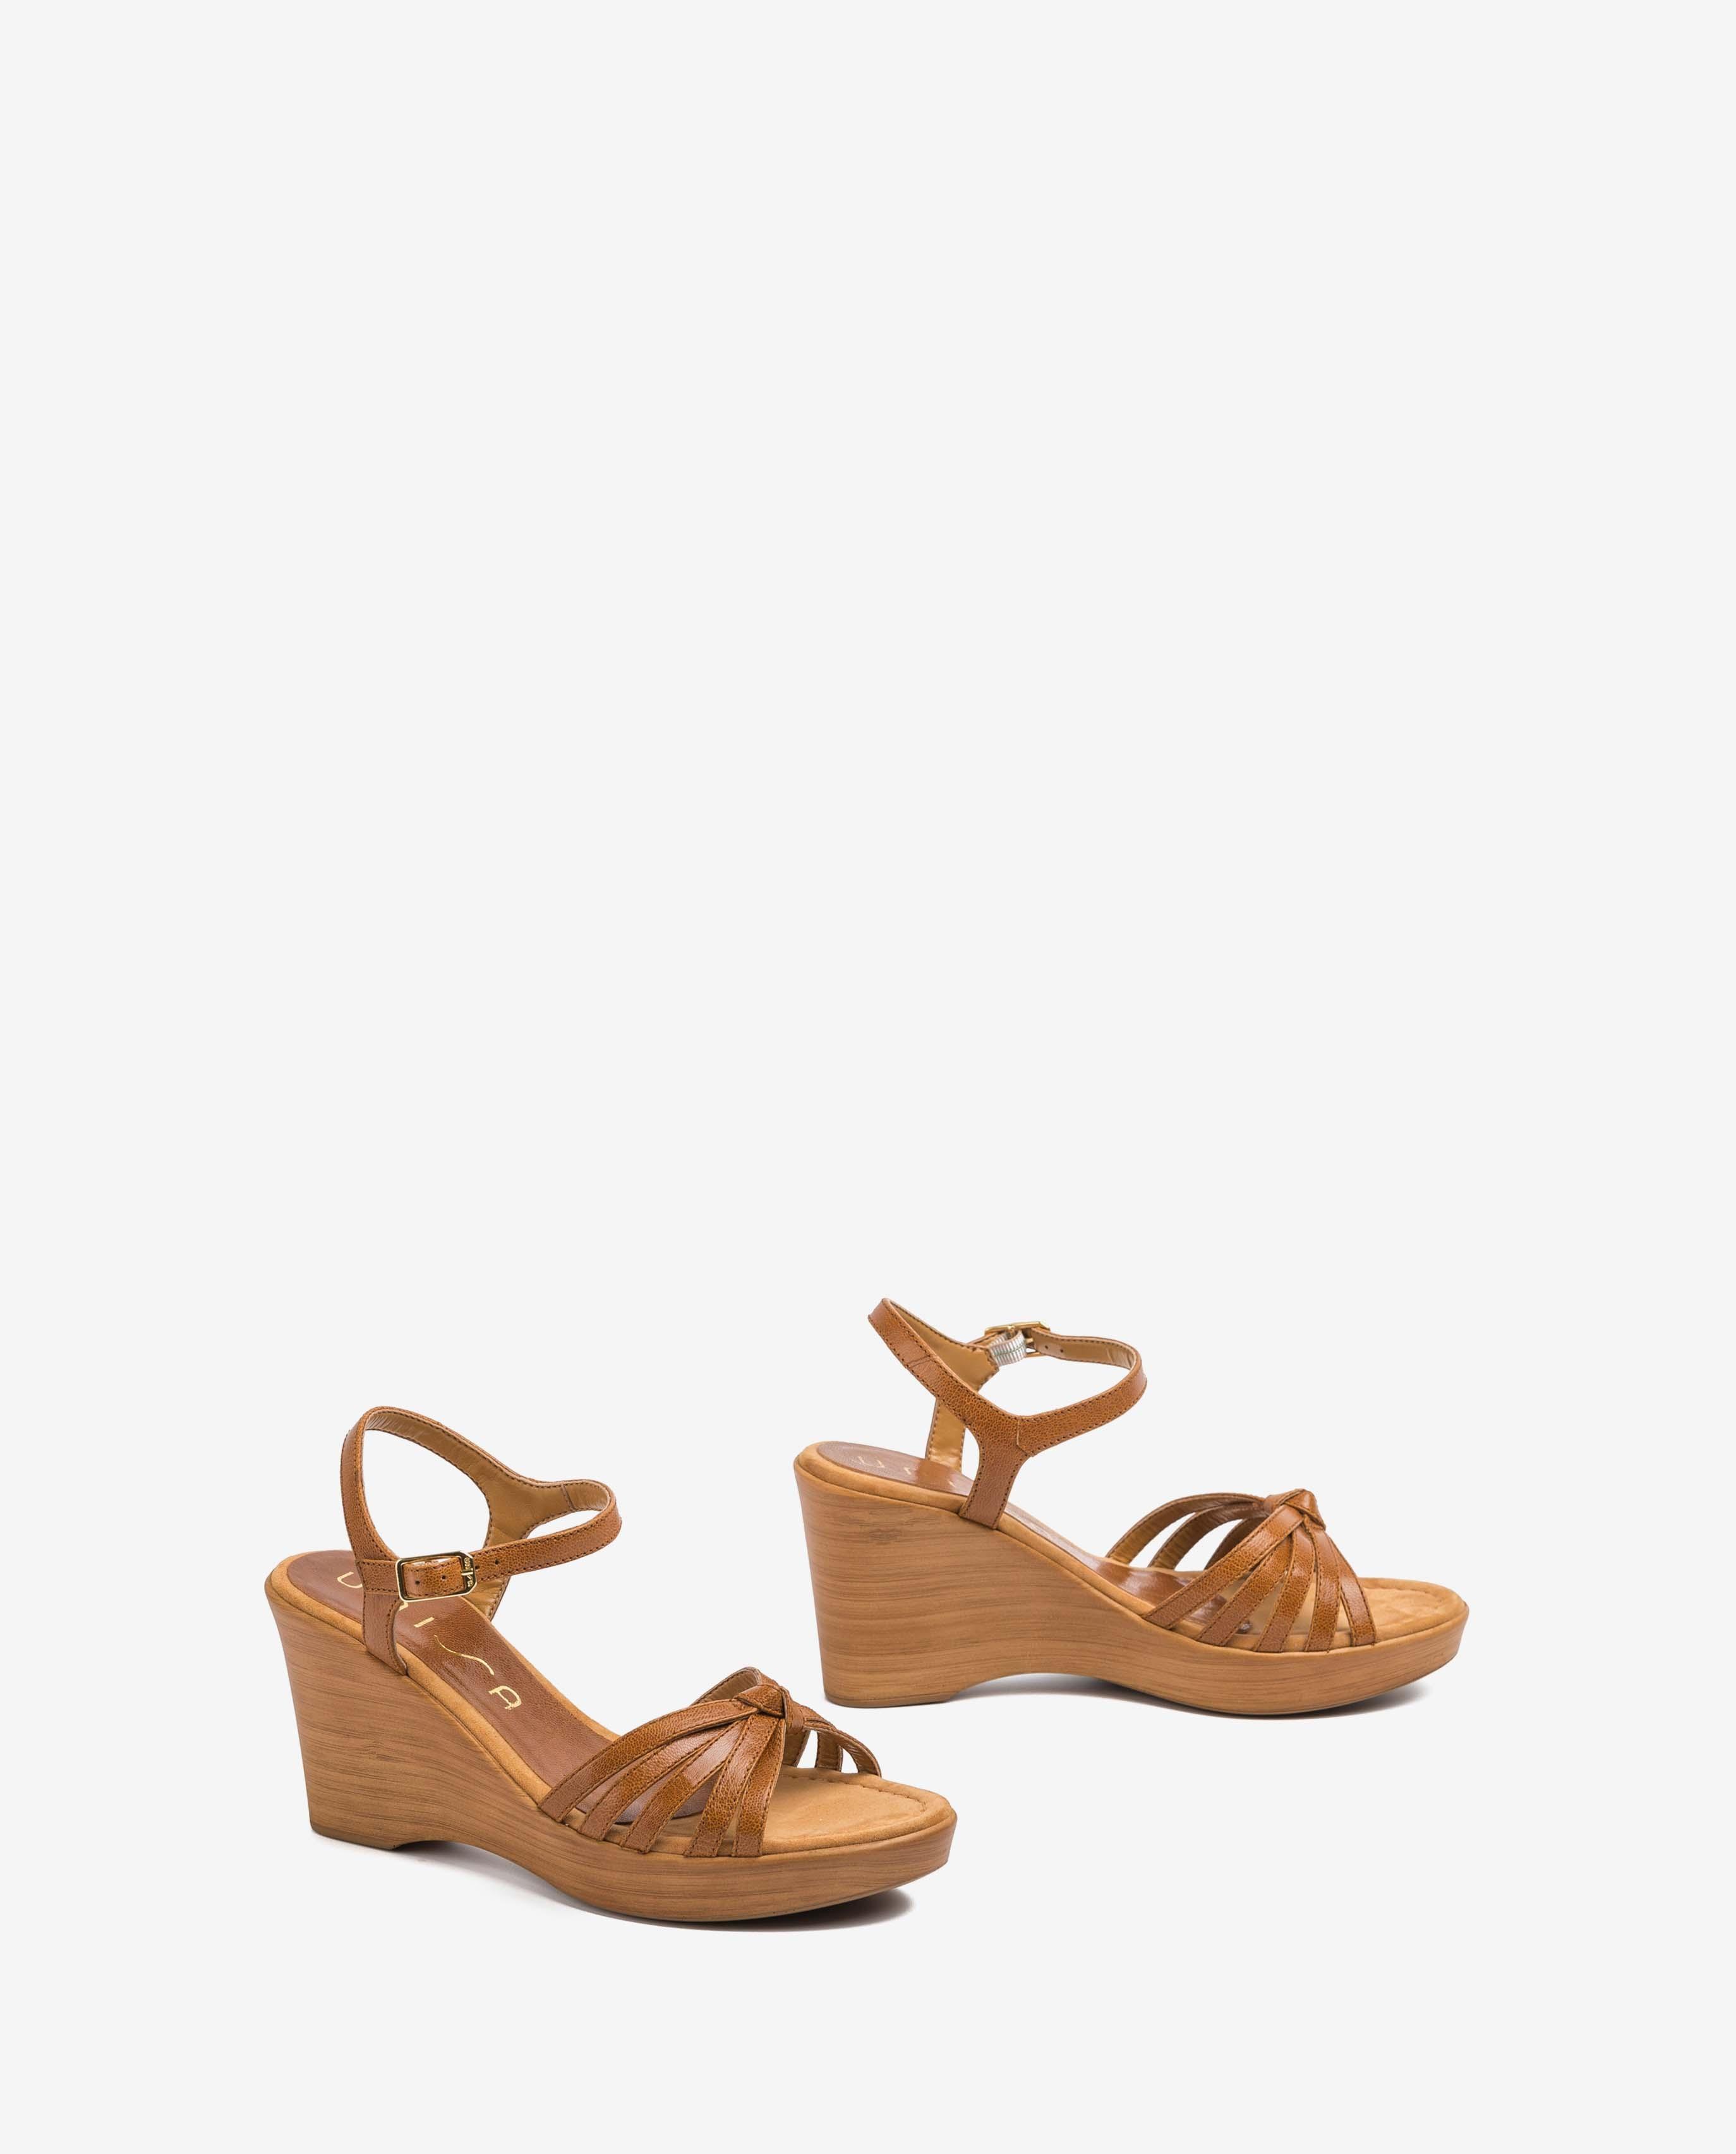 UNISA Brown straps sandals RAMIREZ_GCR saddle 2